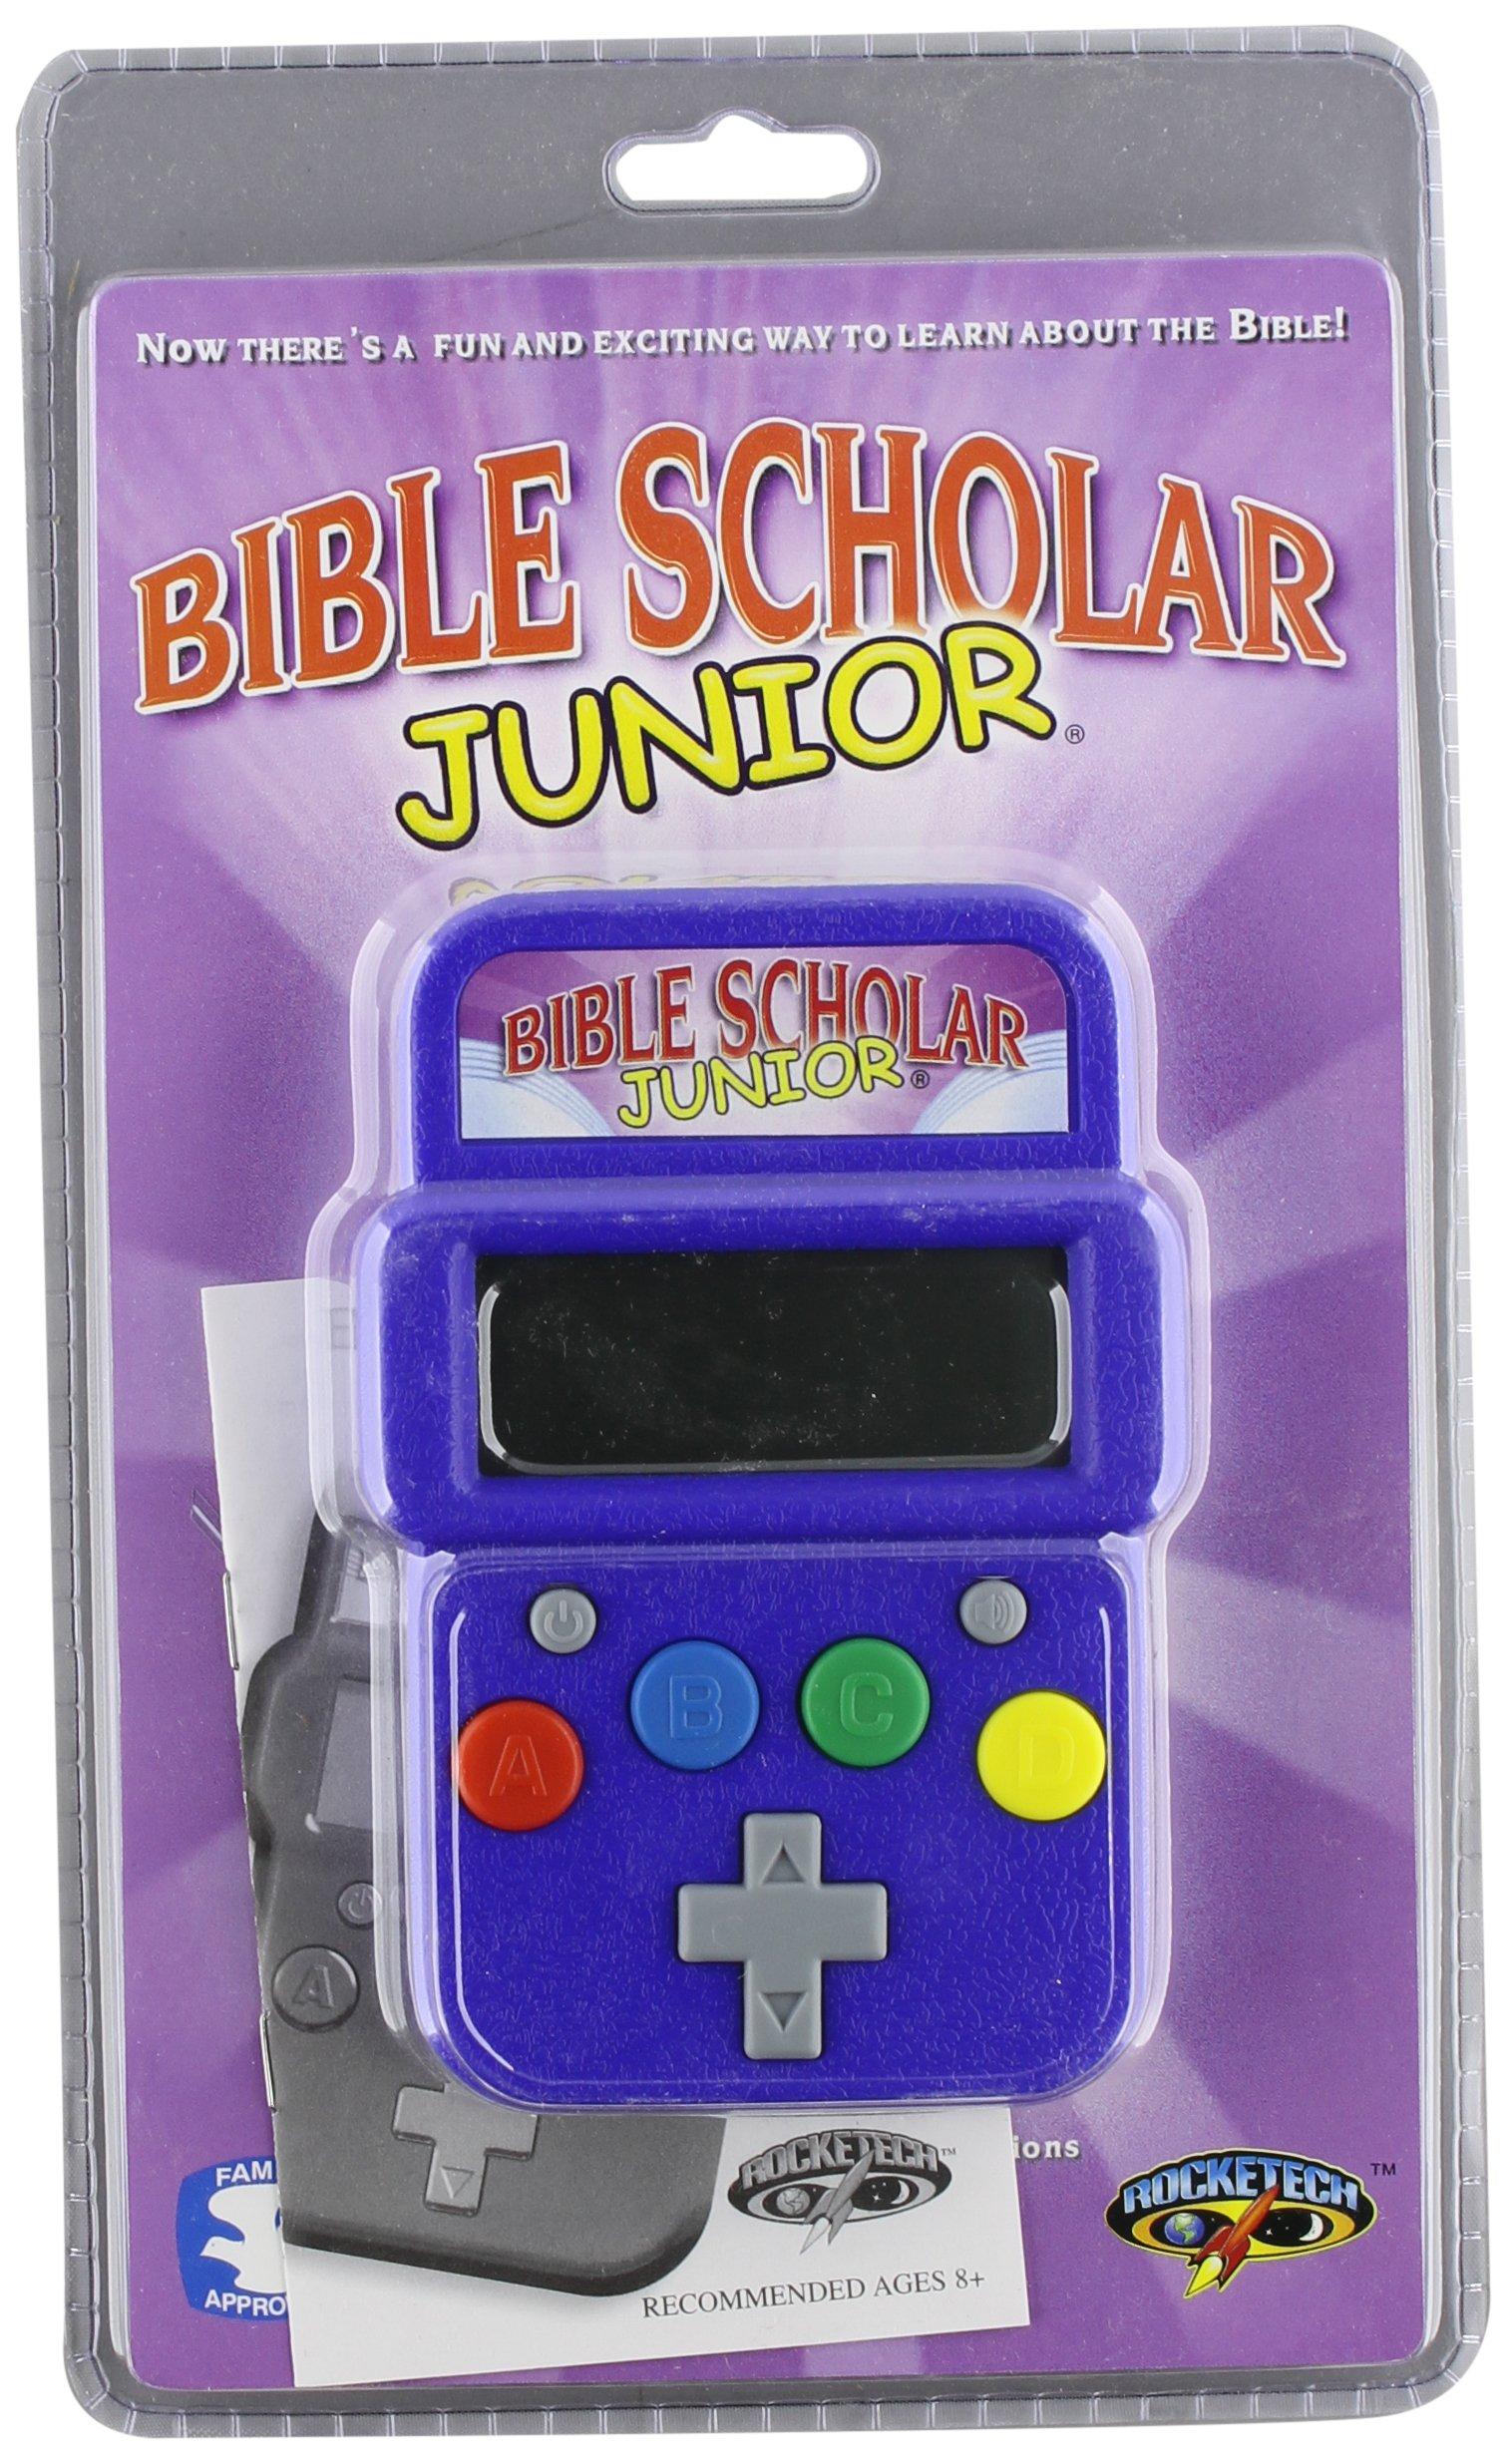 Rocketech Bible Scholar Junior Electronic Hand-Held Game